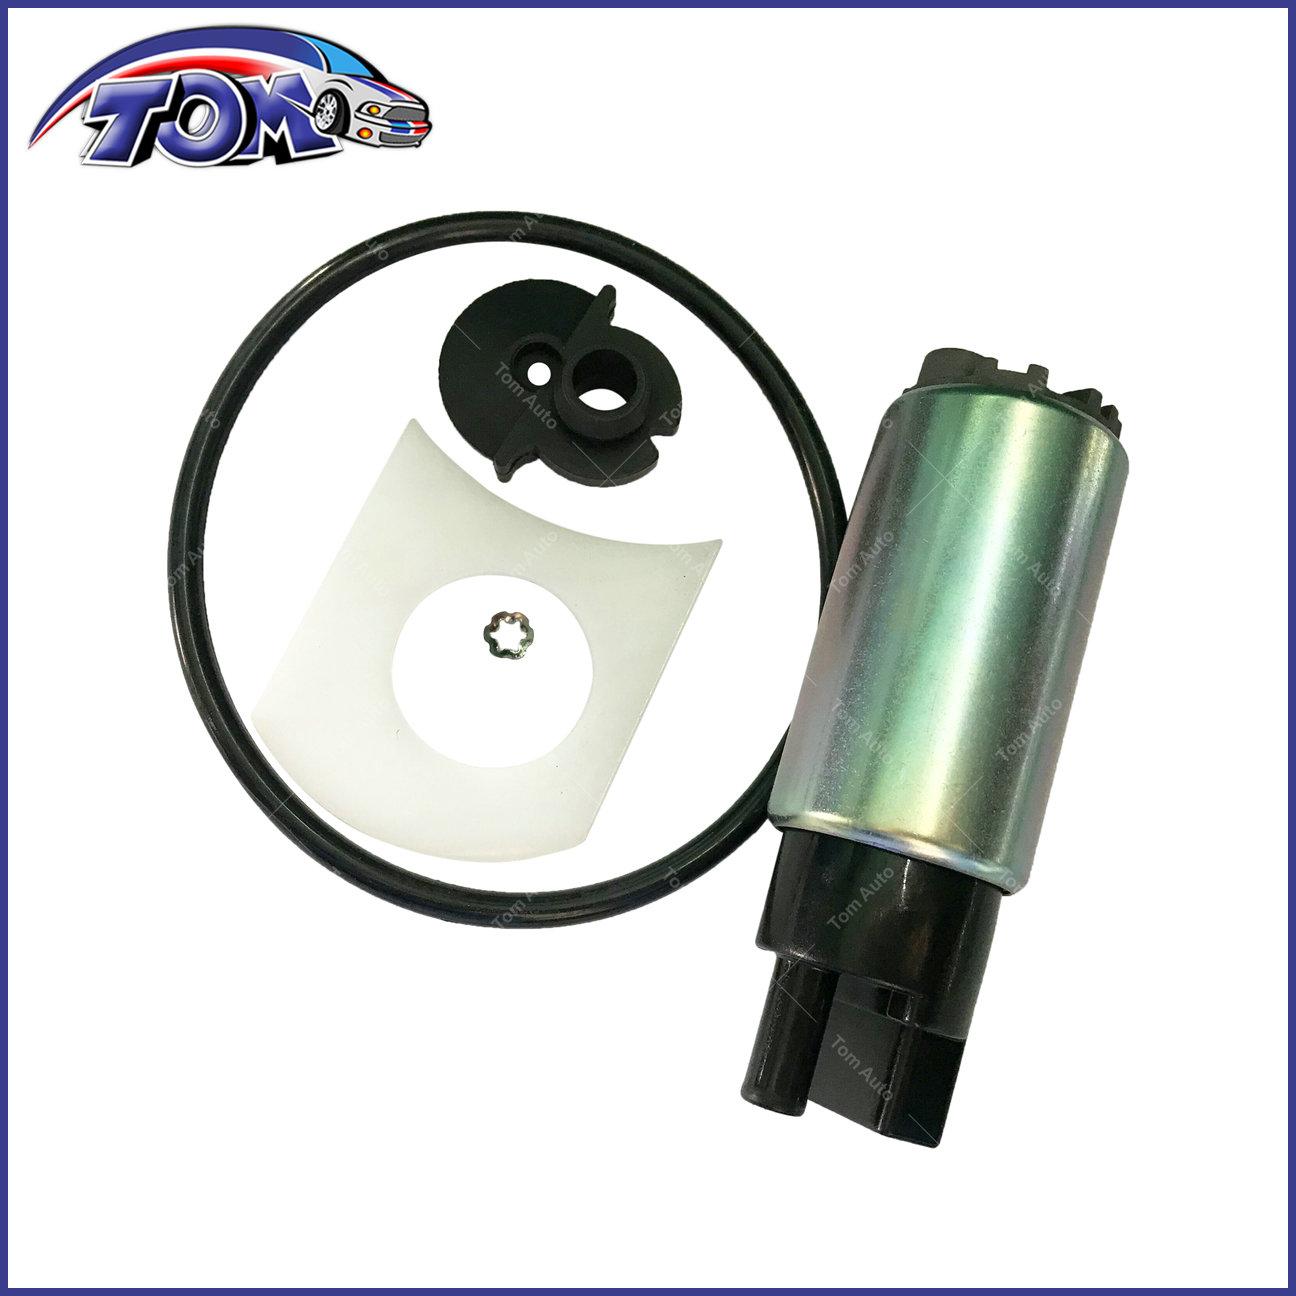 Fuel Pump fits 1997-2002 Saturn SC1 SC2 SL SL1 SL2 SW1 SW2 L4 1.9L GA1007